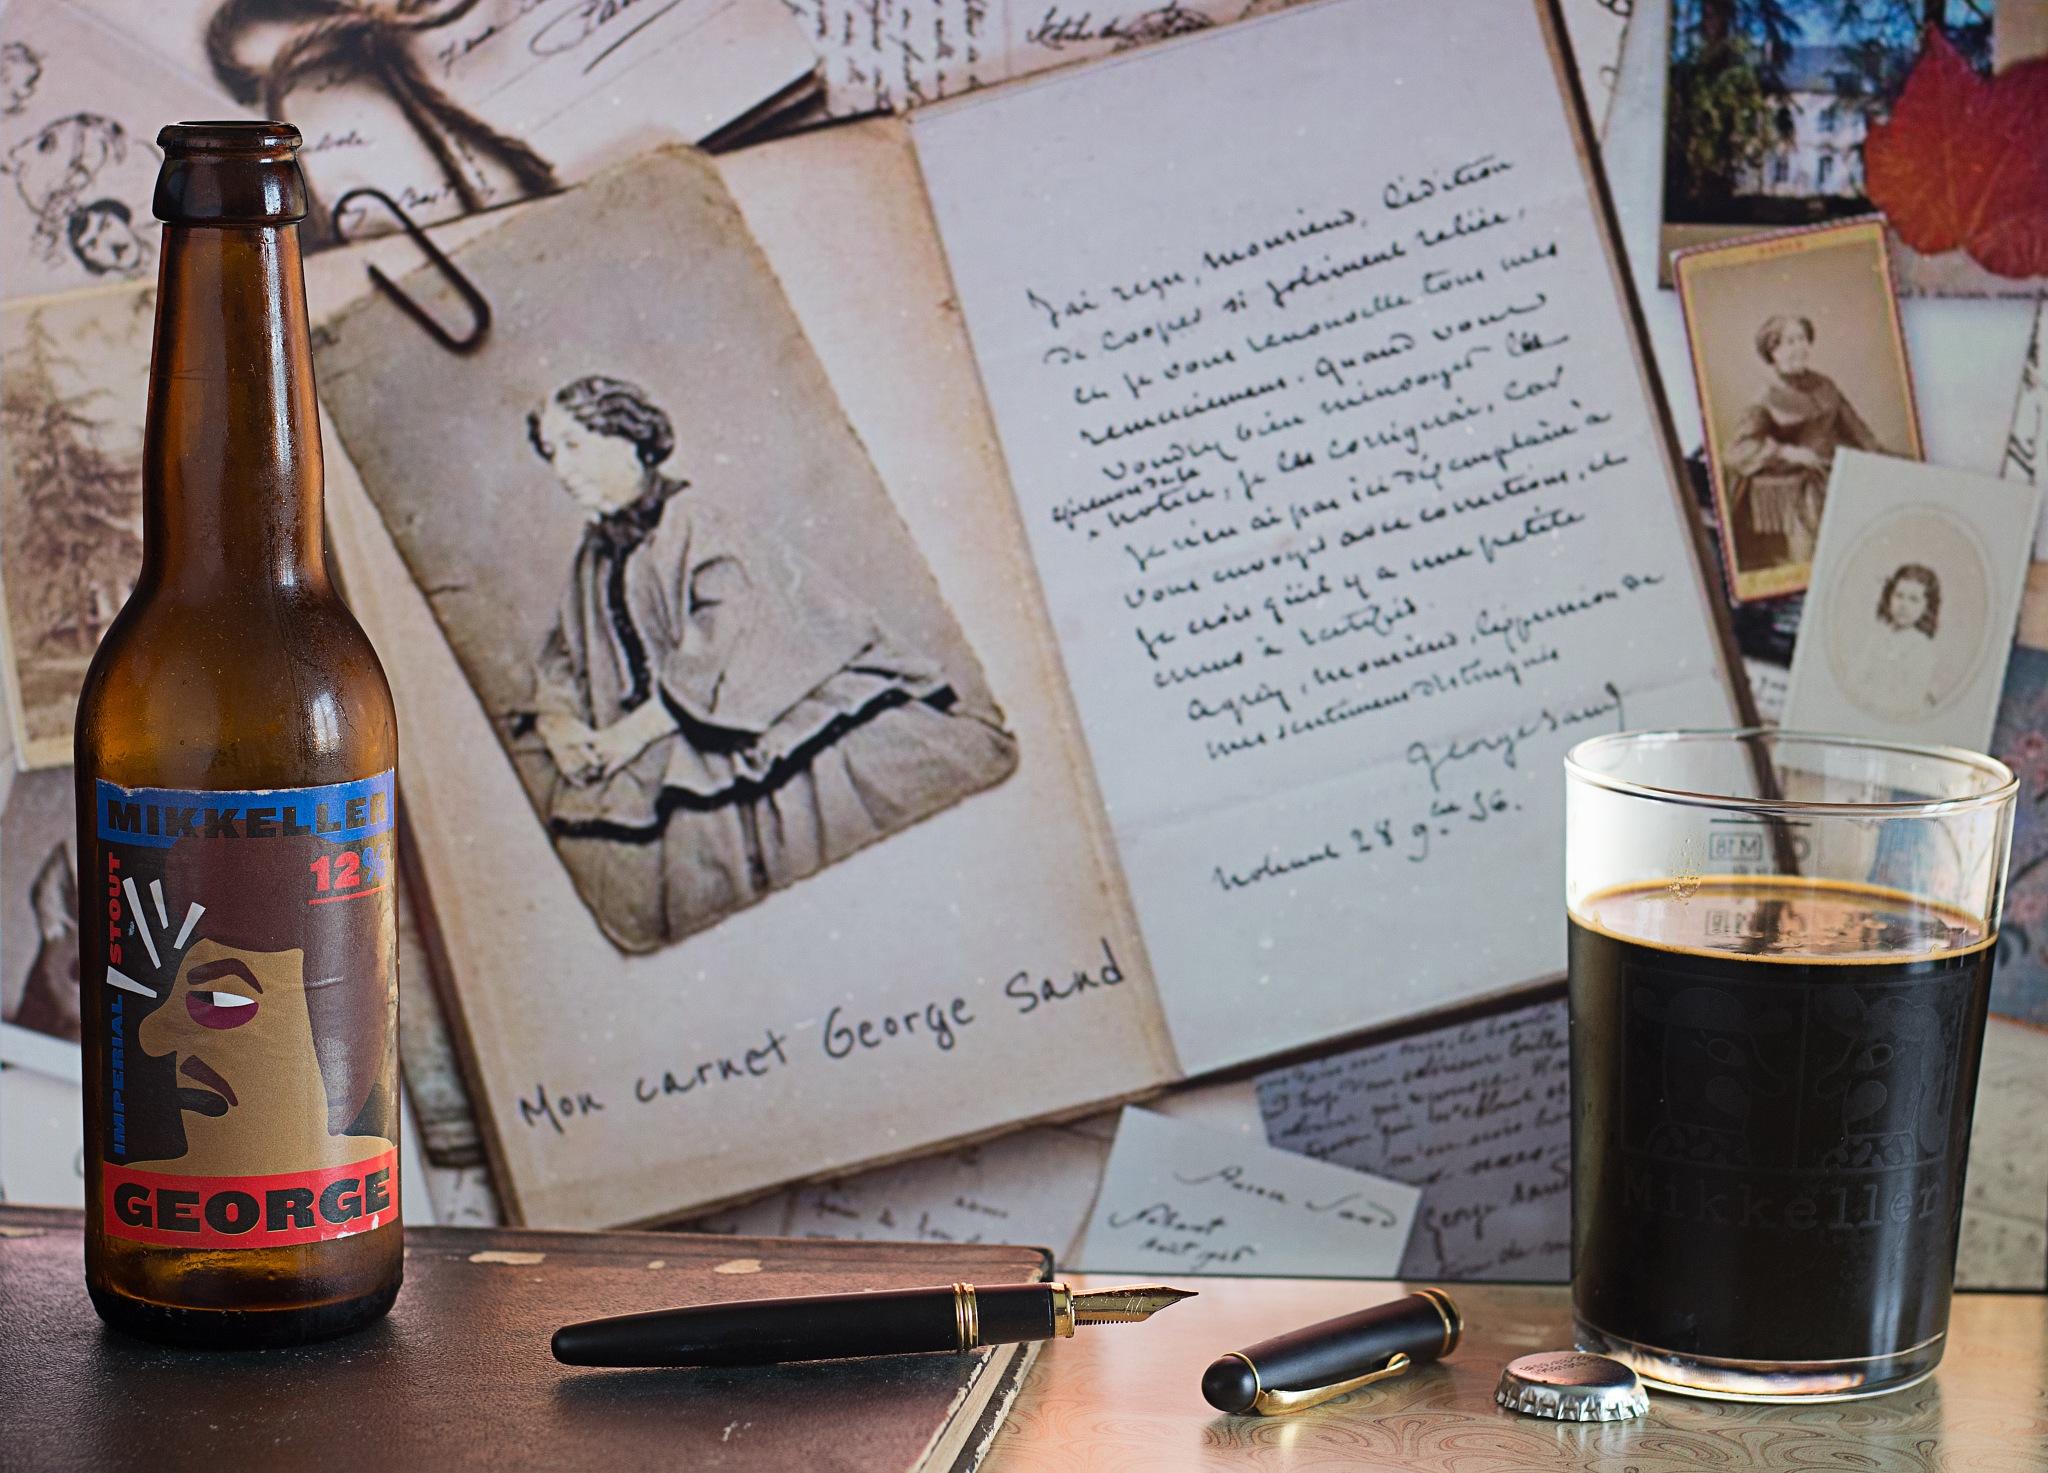 George & carnet de George Sand by Franck Rouanet